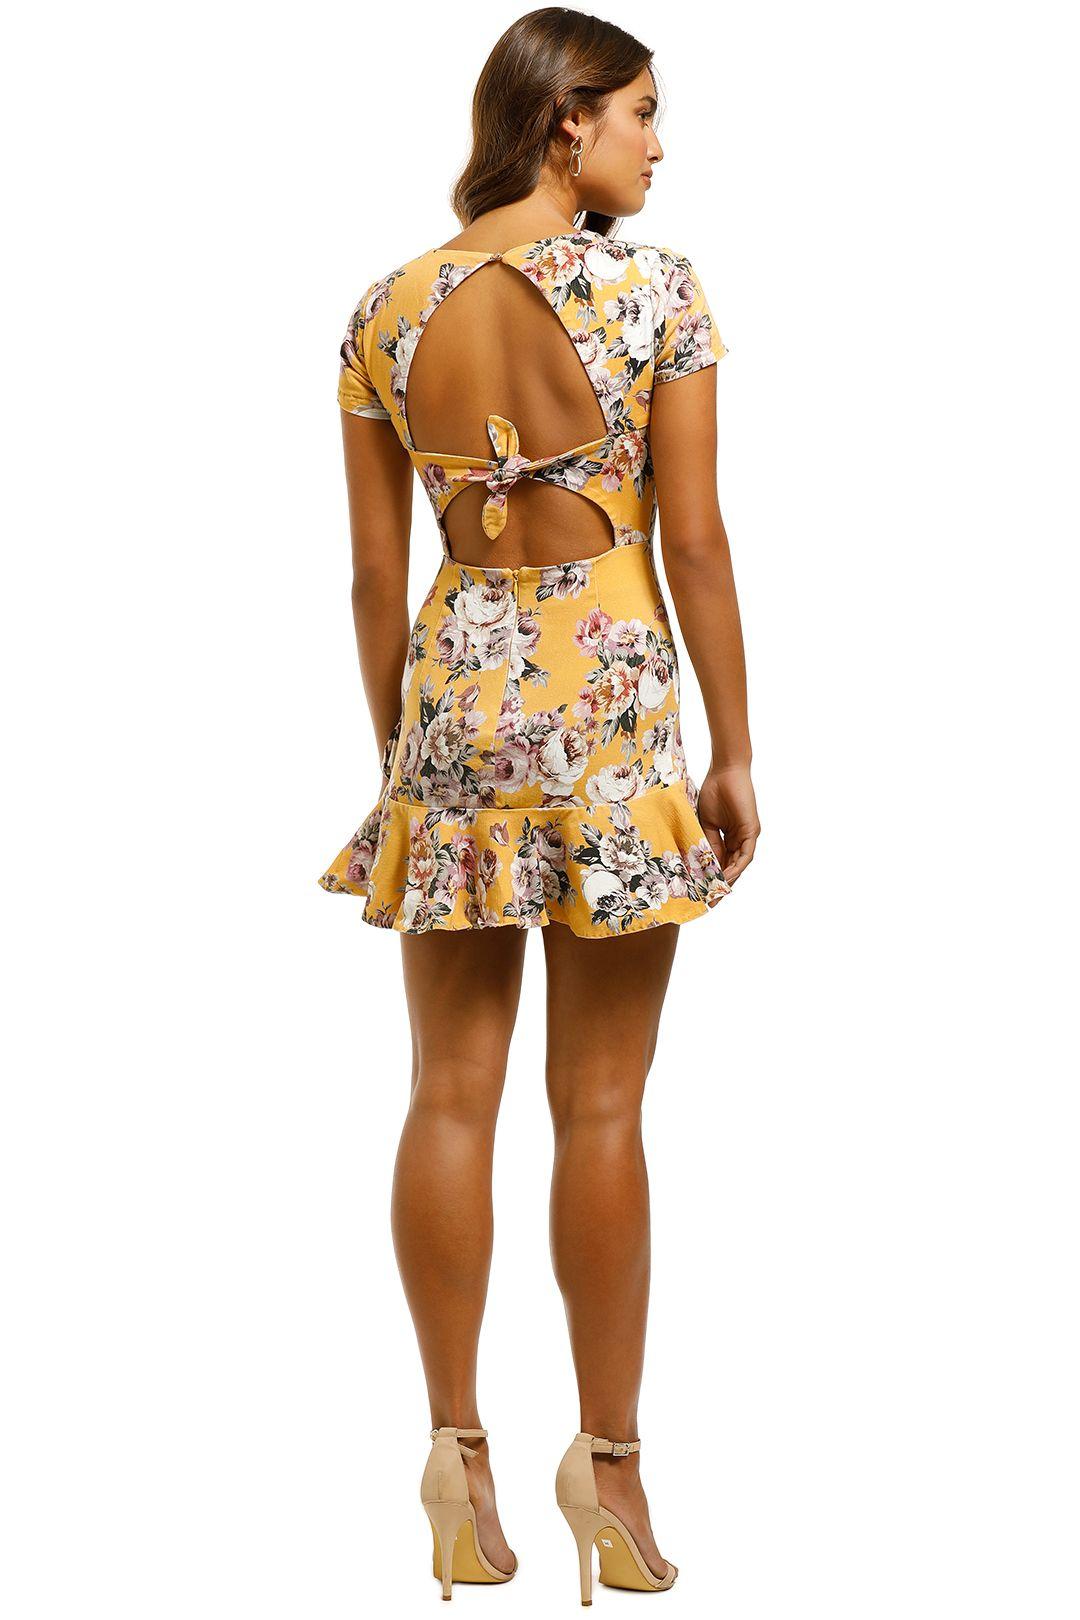 Pasduchas - Havana Flip Dress - Marigold - Back